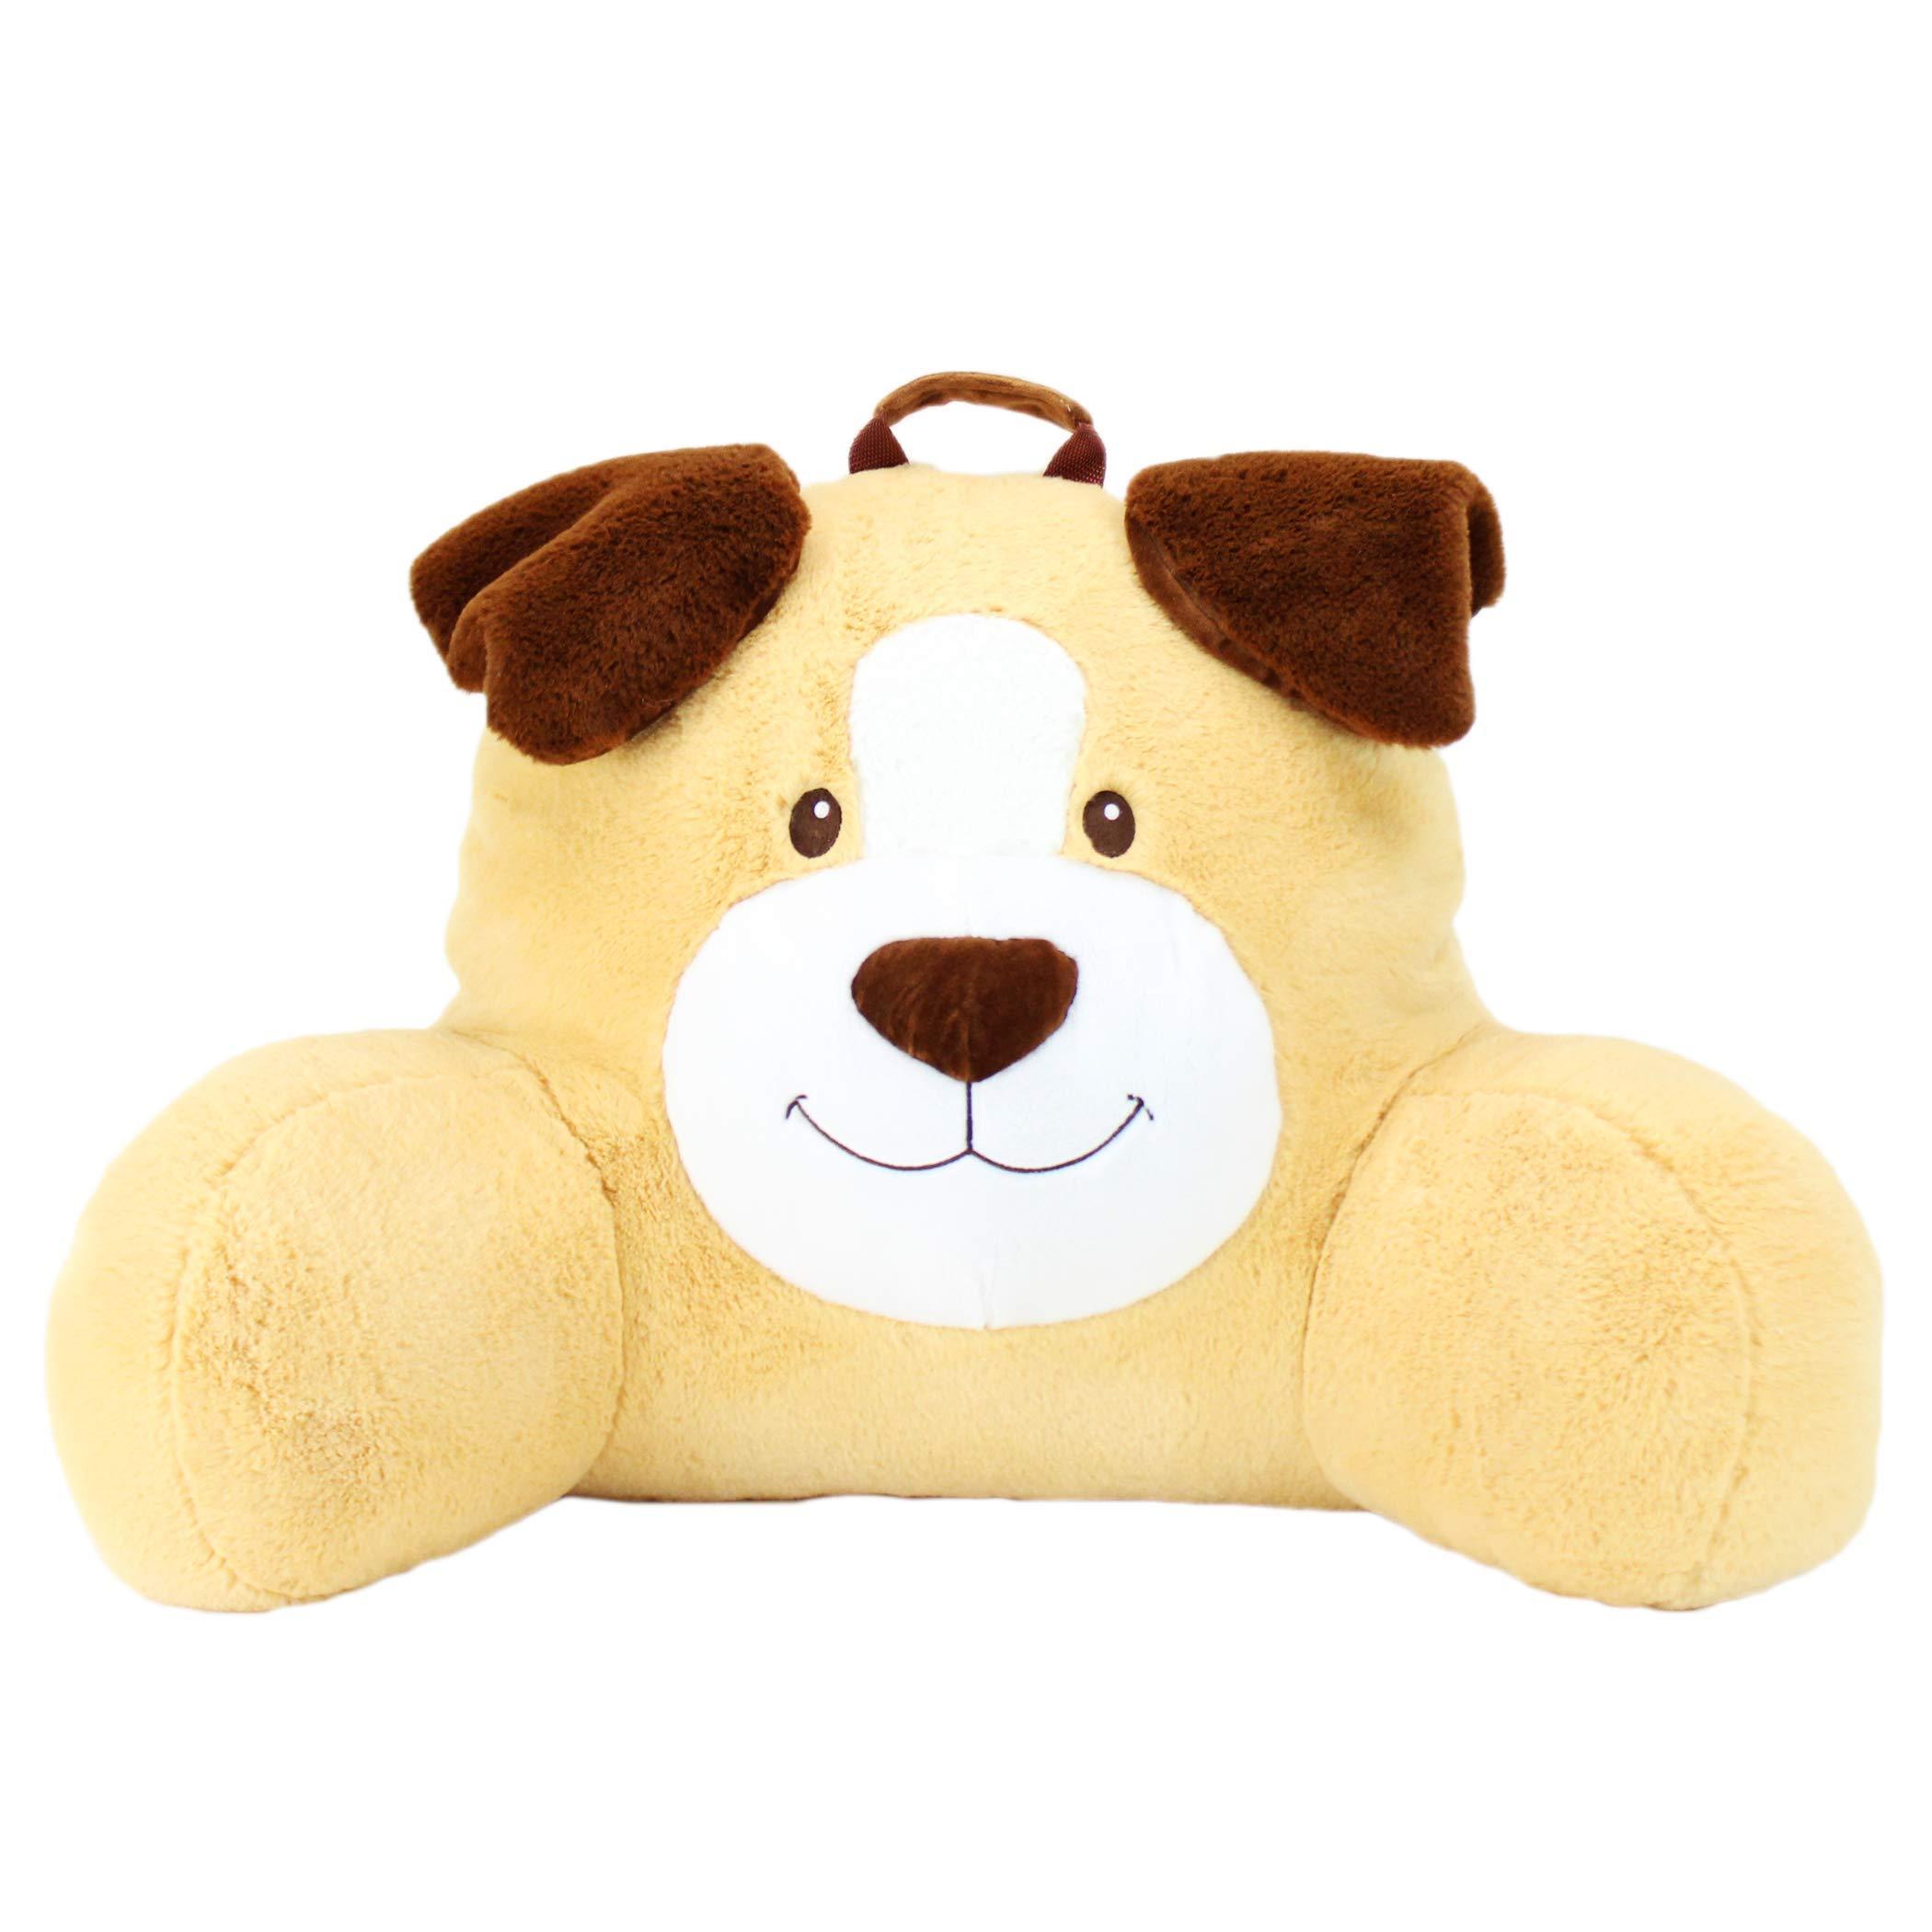 Sweet Seats Face Cushion Dog Plush Character Pillow, Buttercup, 14'' x 26'' x 16''